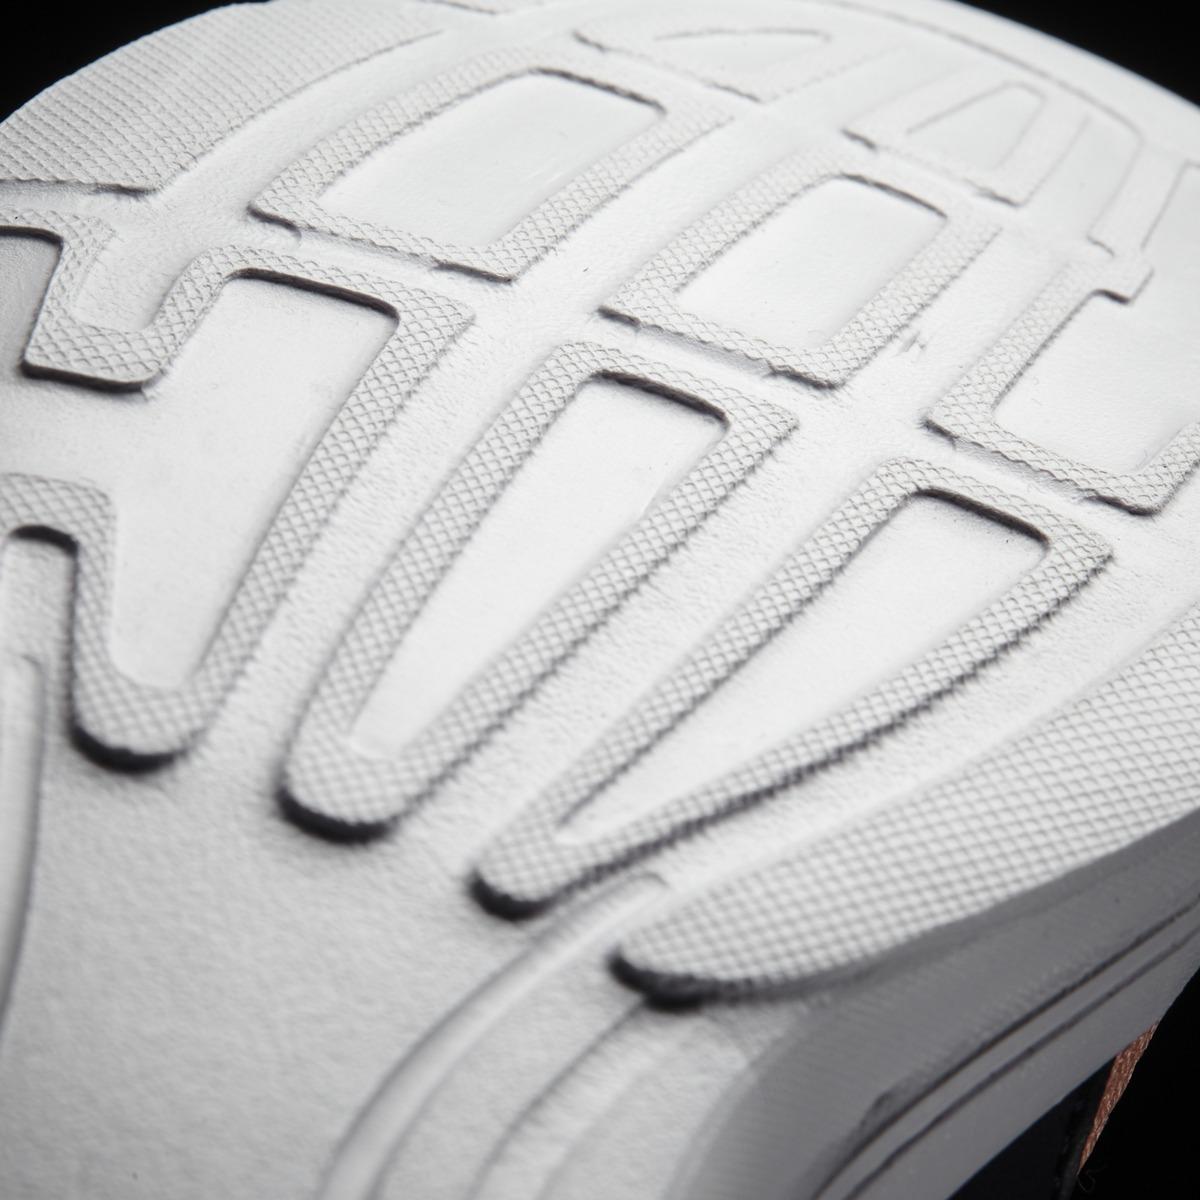 new product e4f9d f0d66 zapatillas adidas training essential fun ii w mujer sava. Cargando zoom.